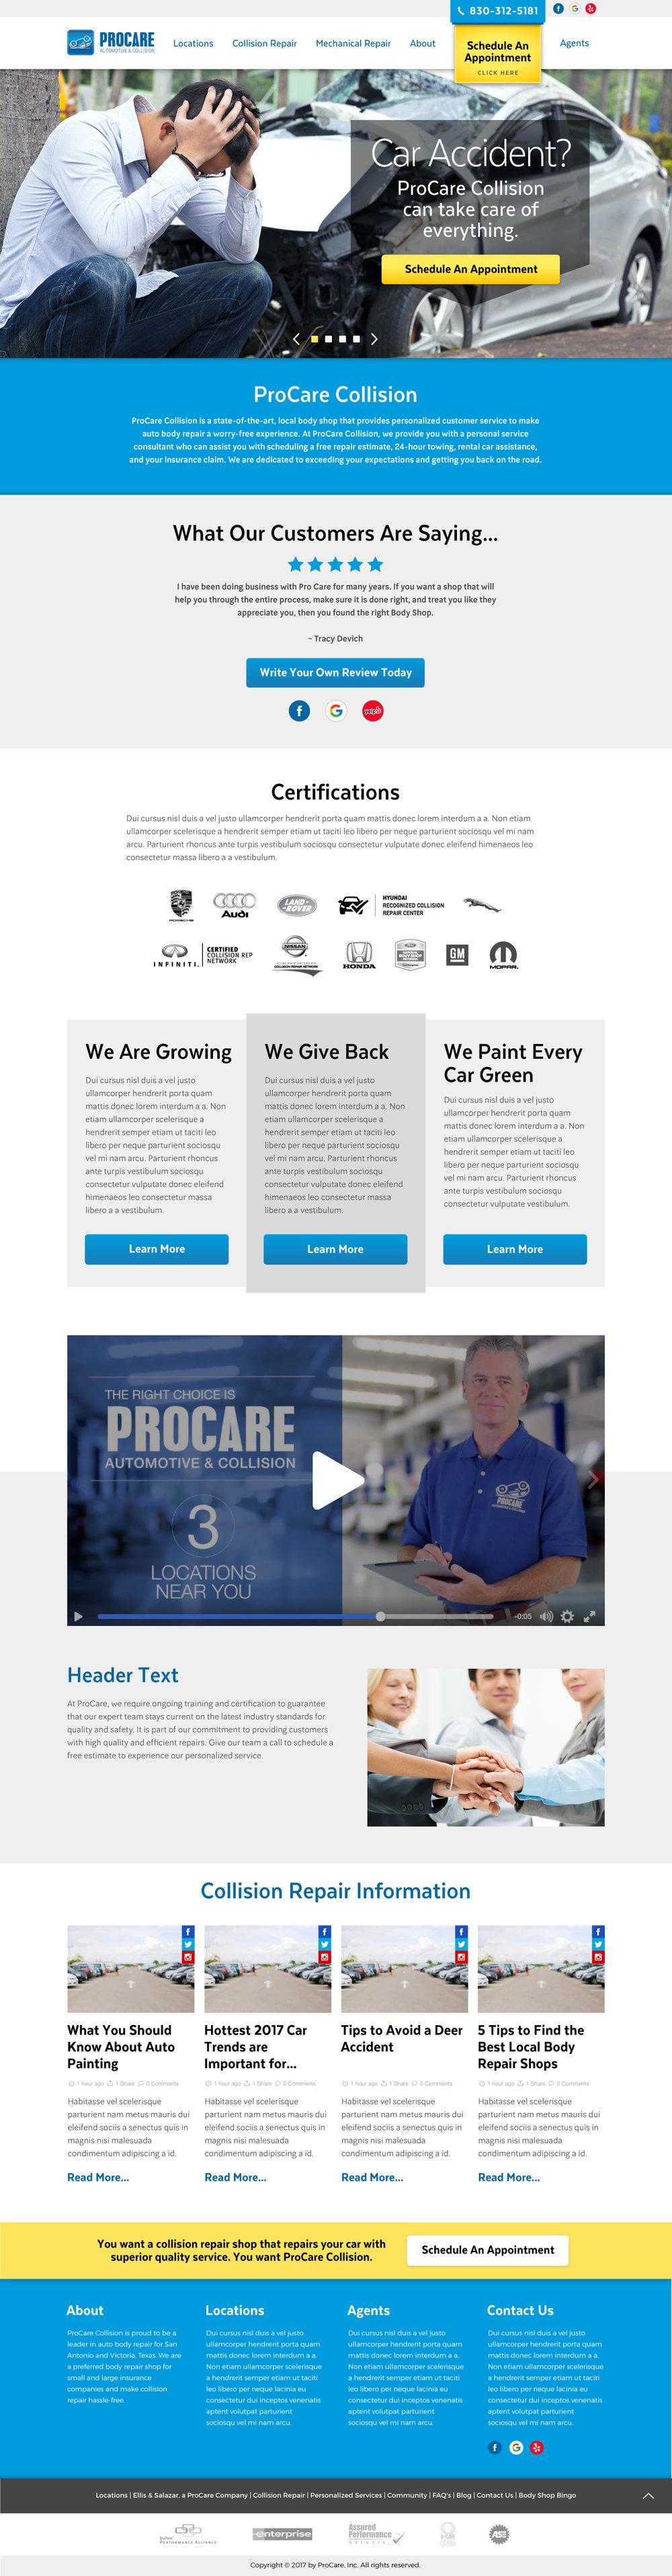 procare-landing-page-template-3.jpg